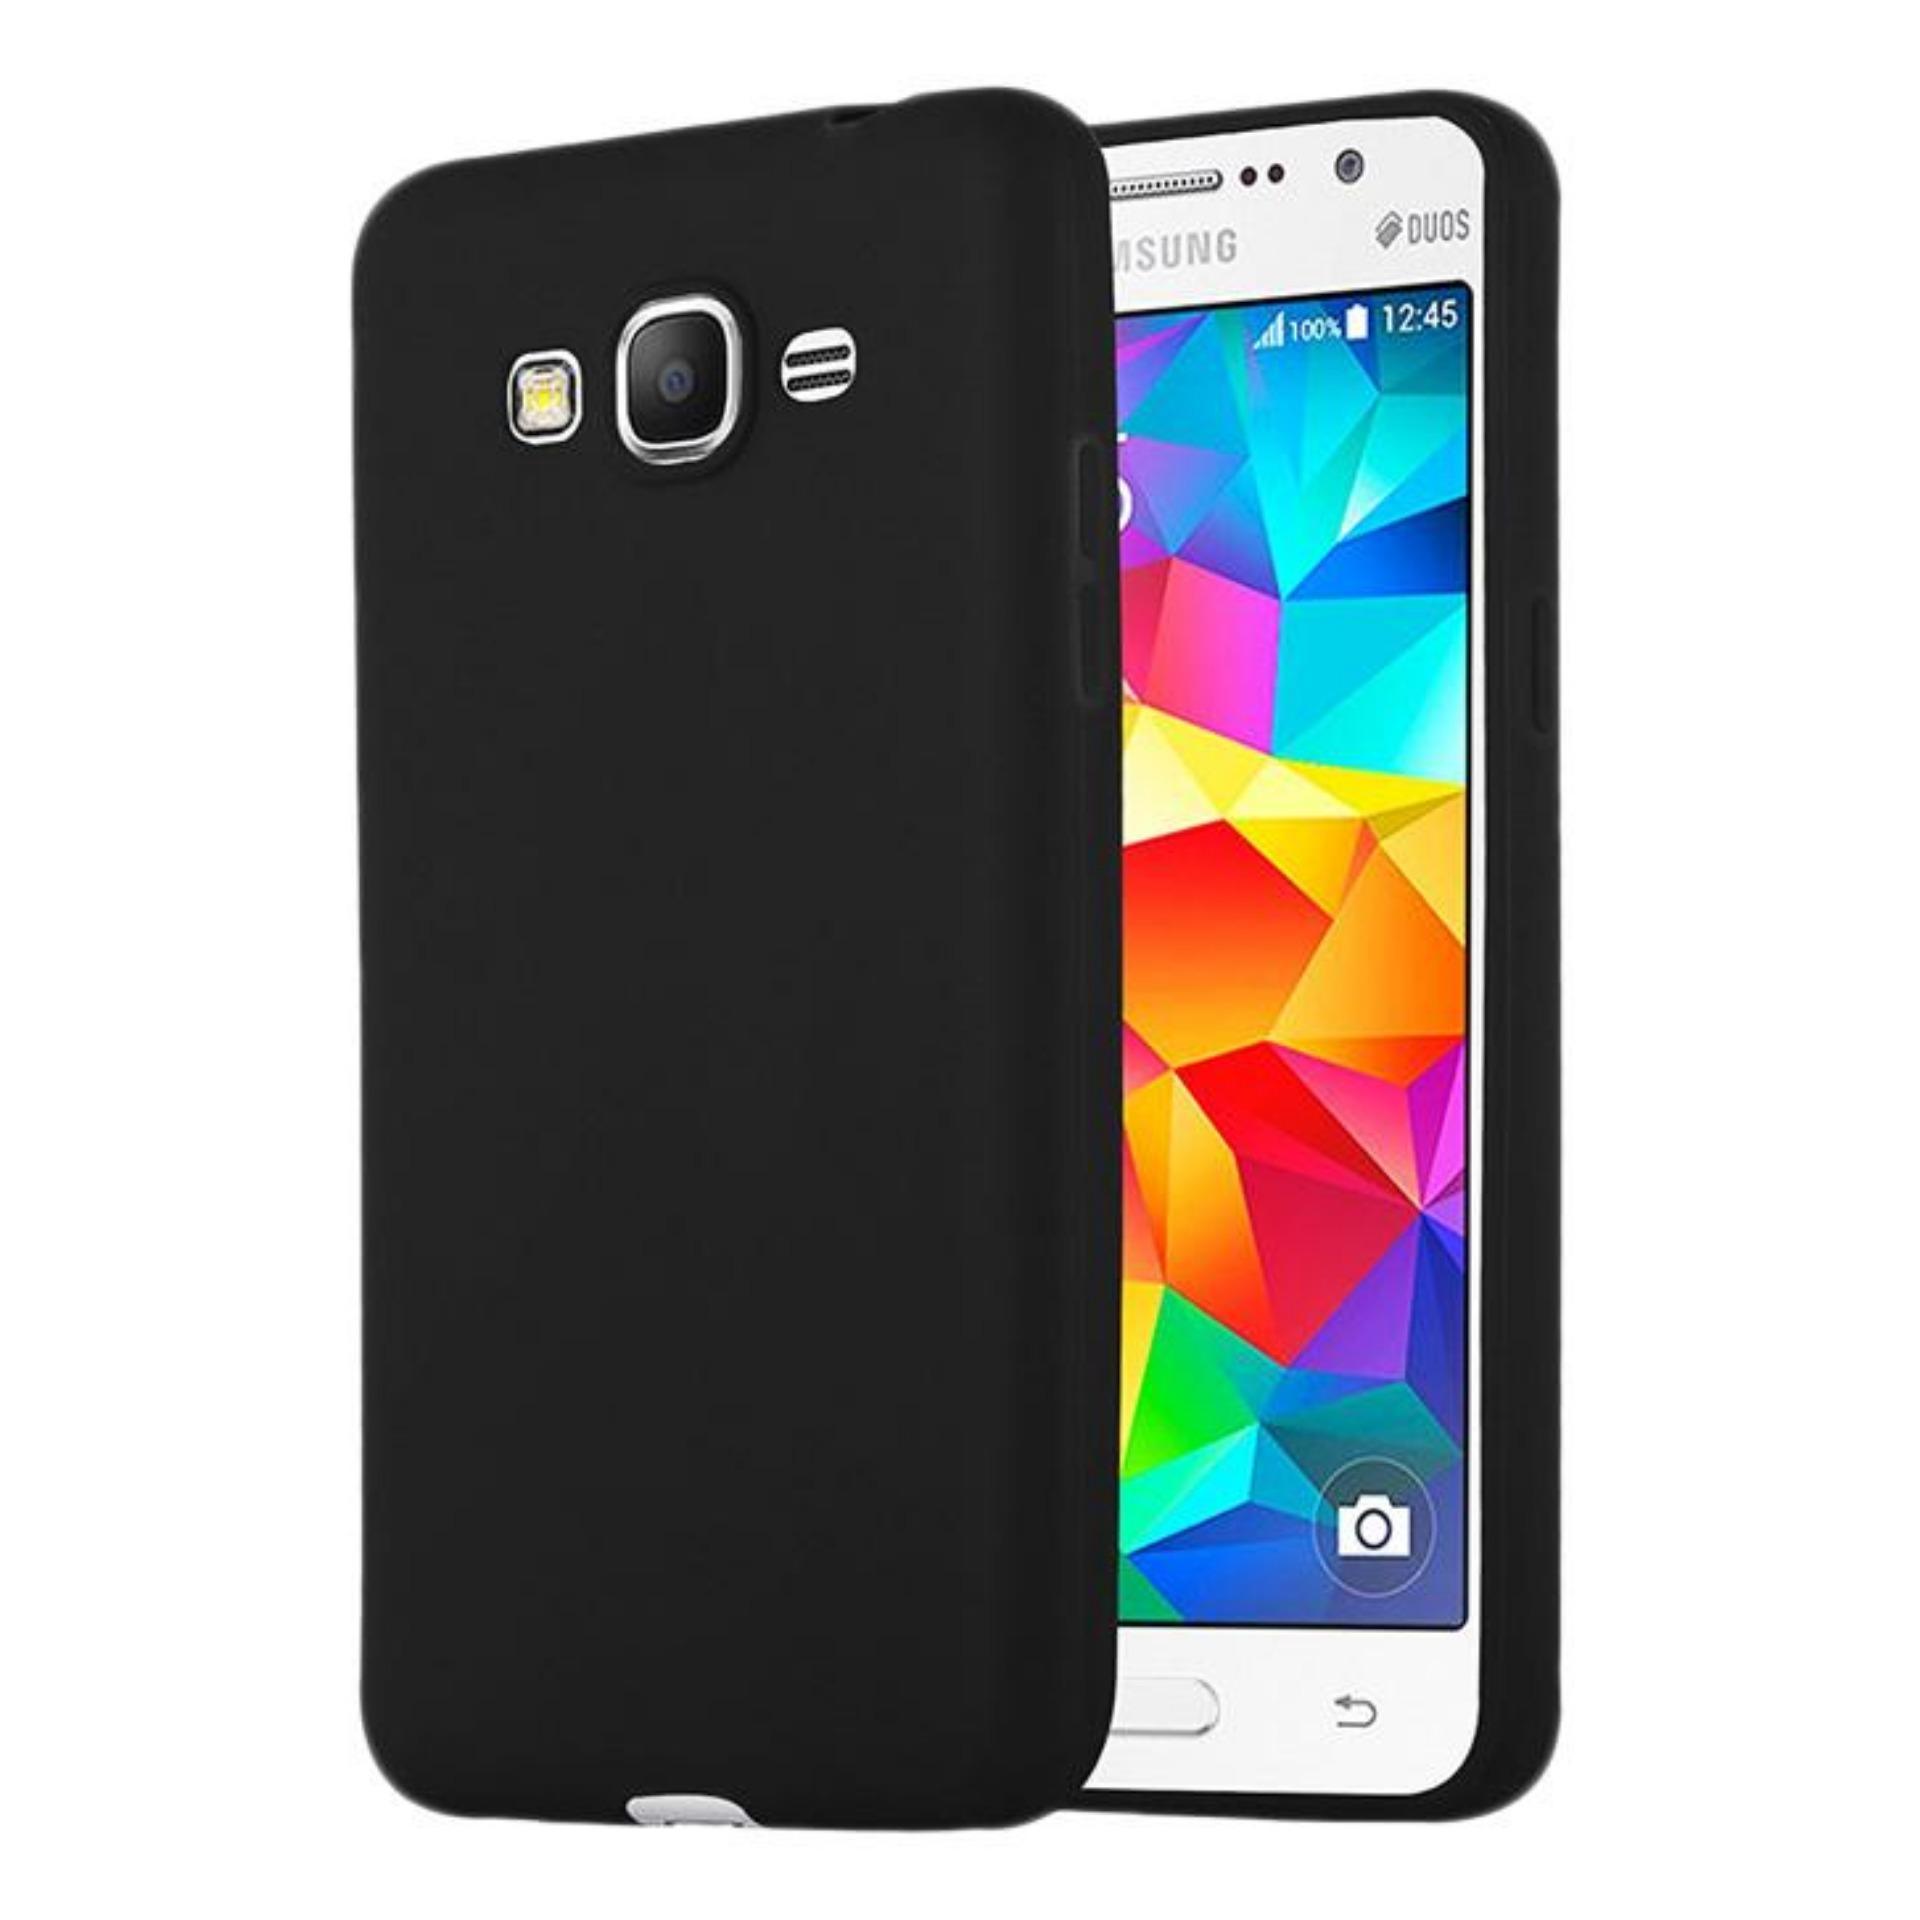 DarkNight for Samsung Galaxy Grand Prime G530 Plus 4G LTE Duos